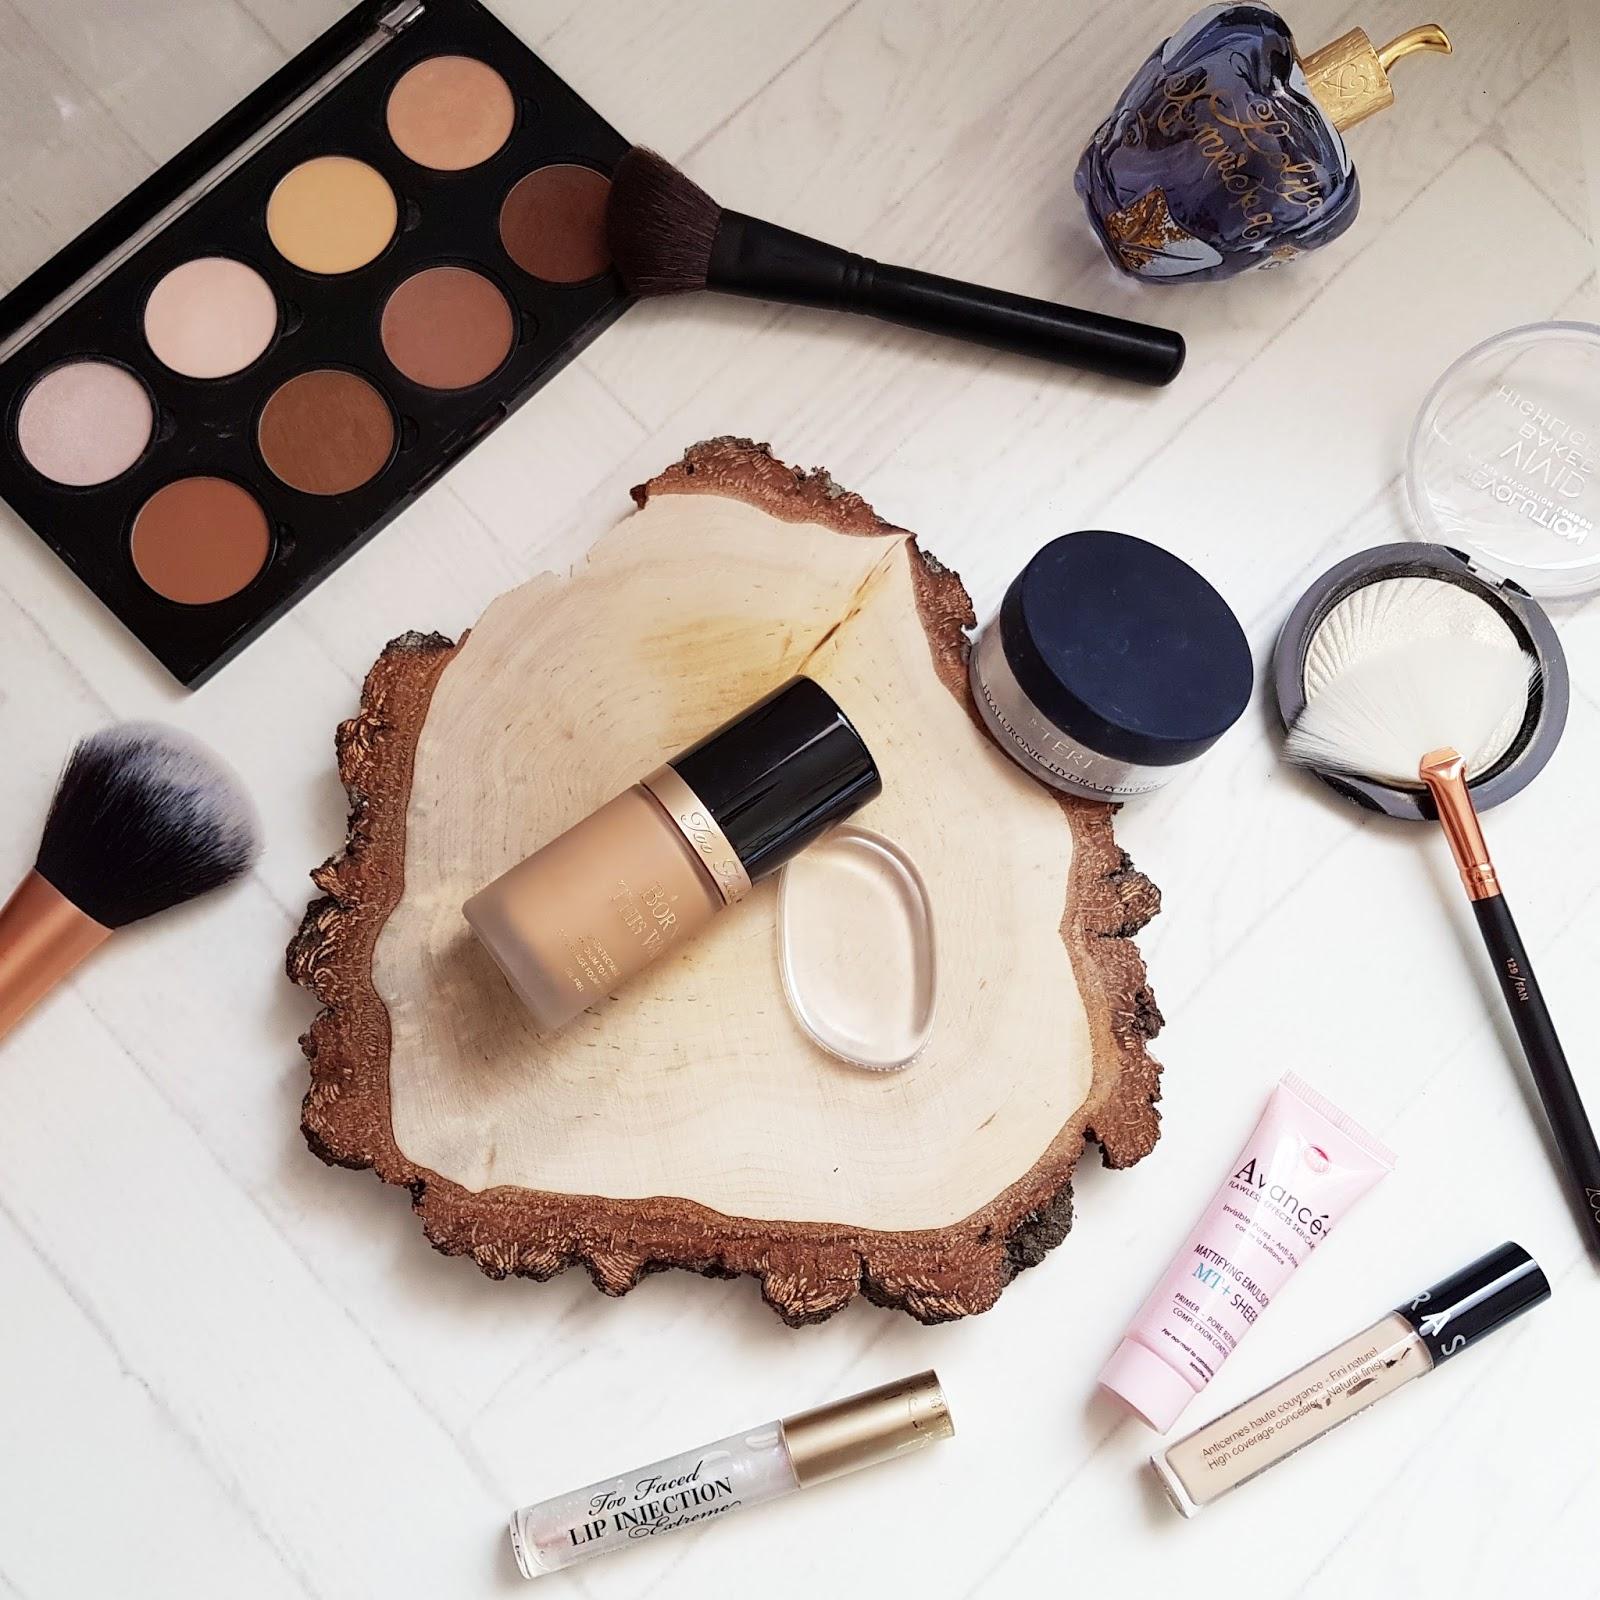 avis_eponge_silicone_pb_cosmetics_concours_partenariat_mama_syca_beaute